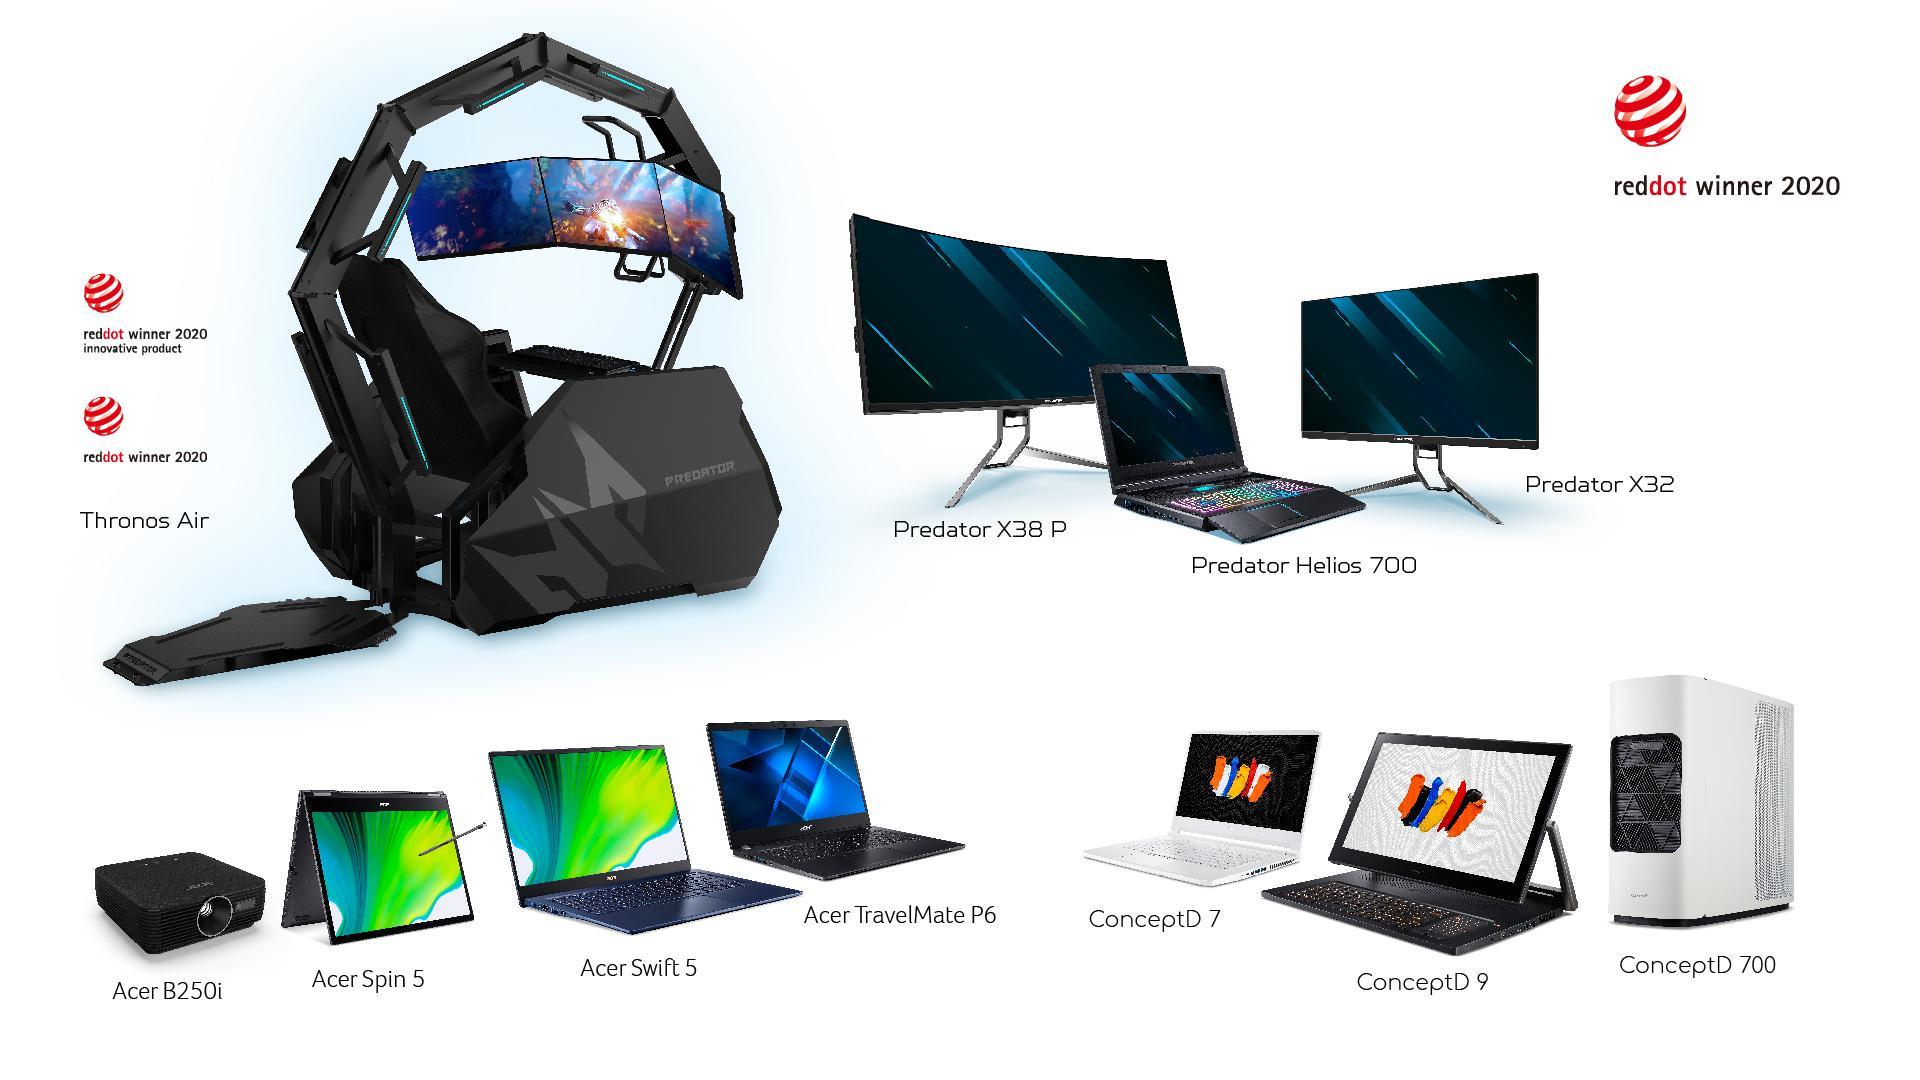 Acer, 12 adet 2020 Red Dot ödülünün sahibi oldu